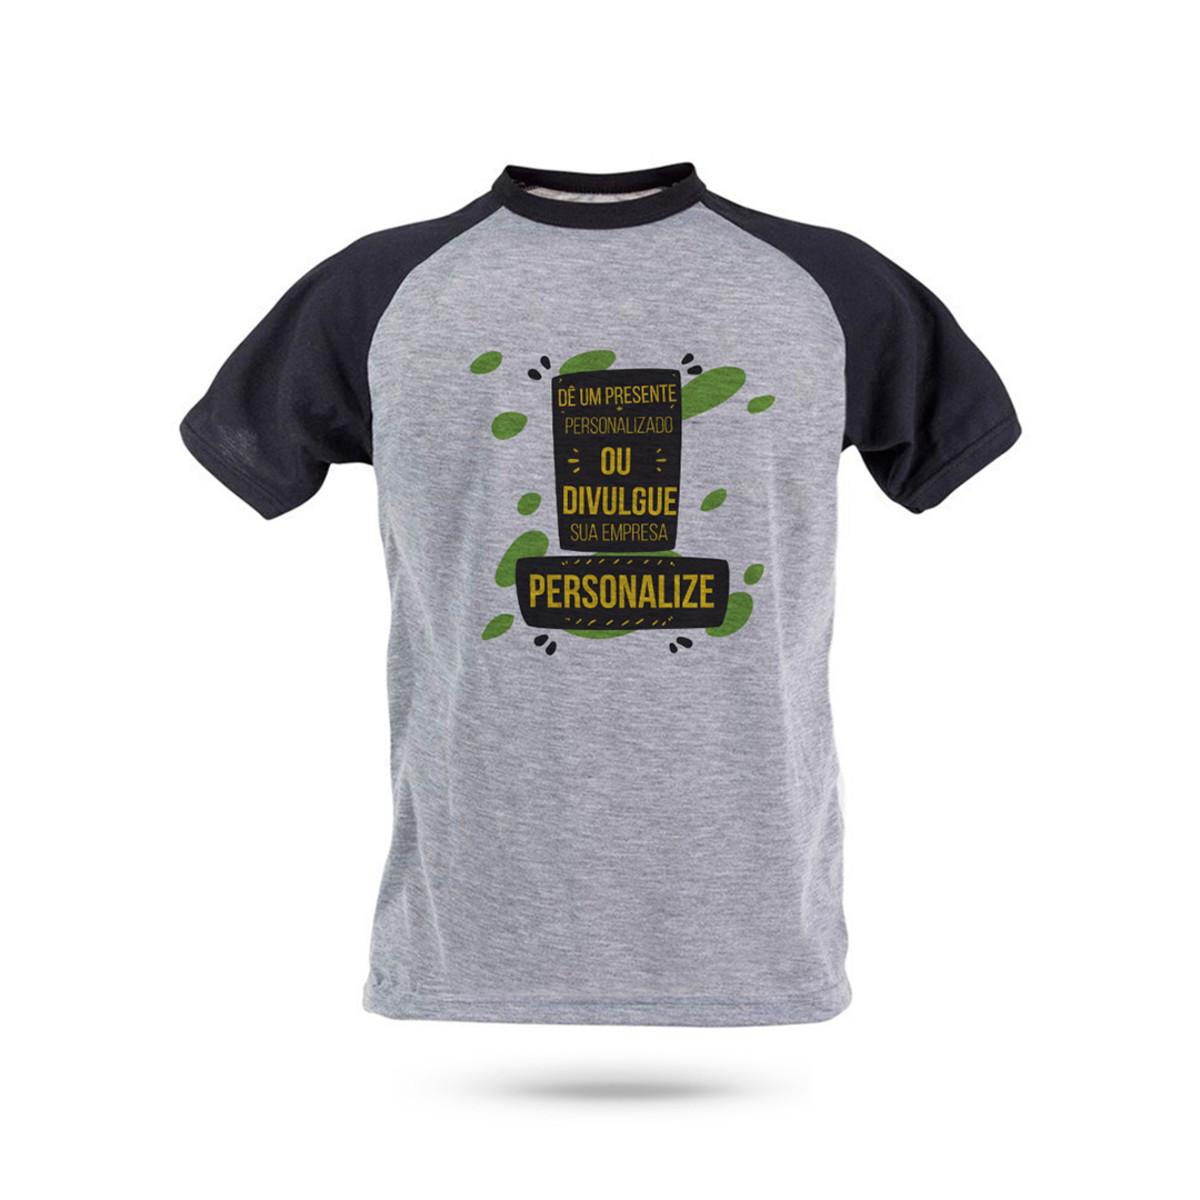 2782049a11 Camiseta Raglan Mescla Masculina Personalizada no Elo7